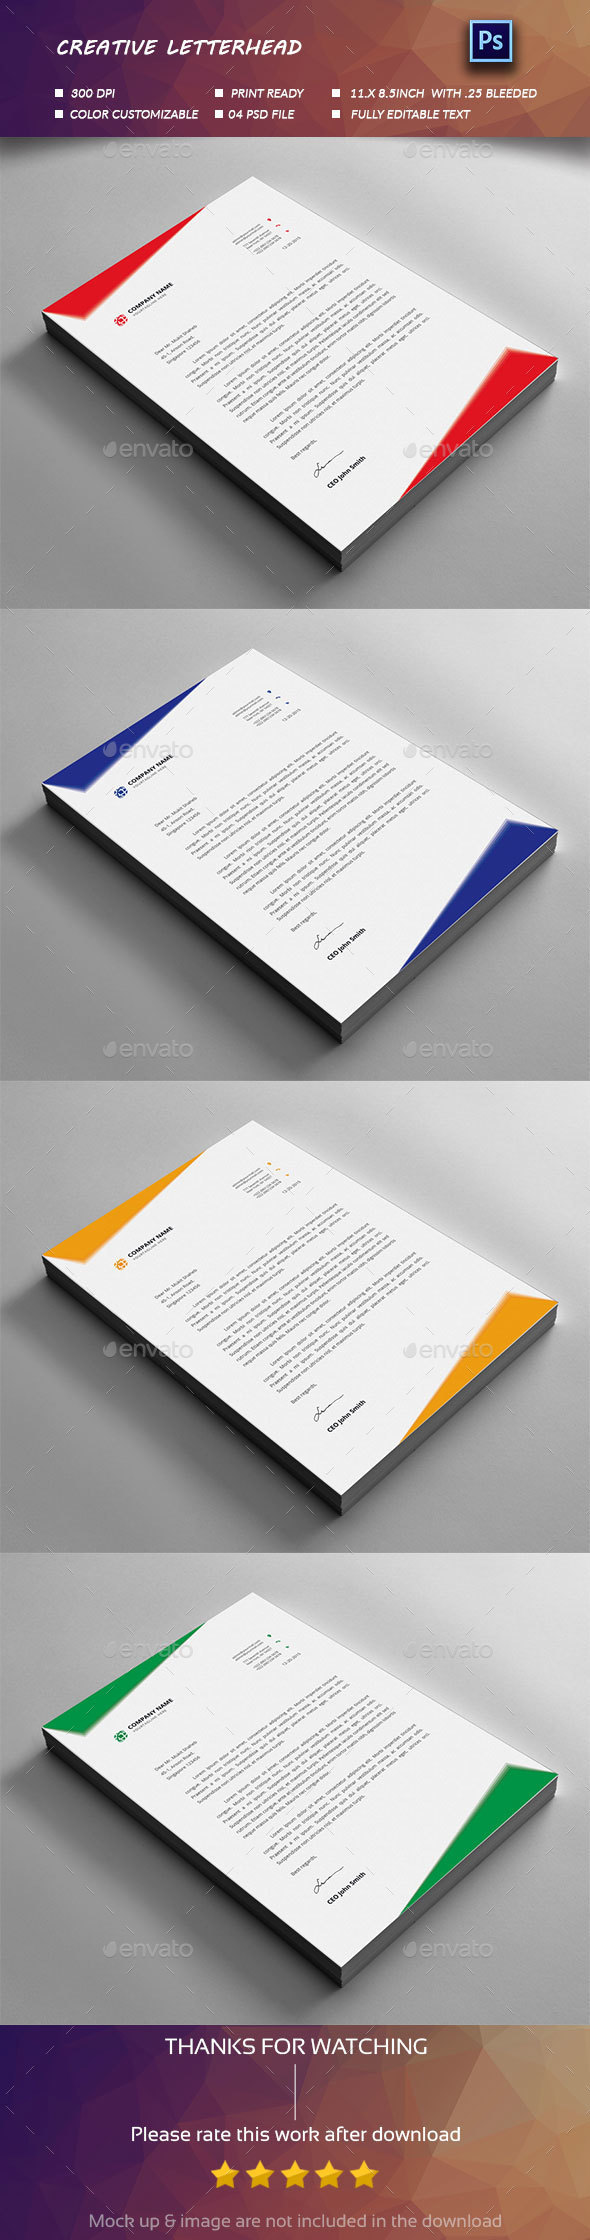 Letterhead design design templates from graphicriver spiritdancerdesigns Choice Image